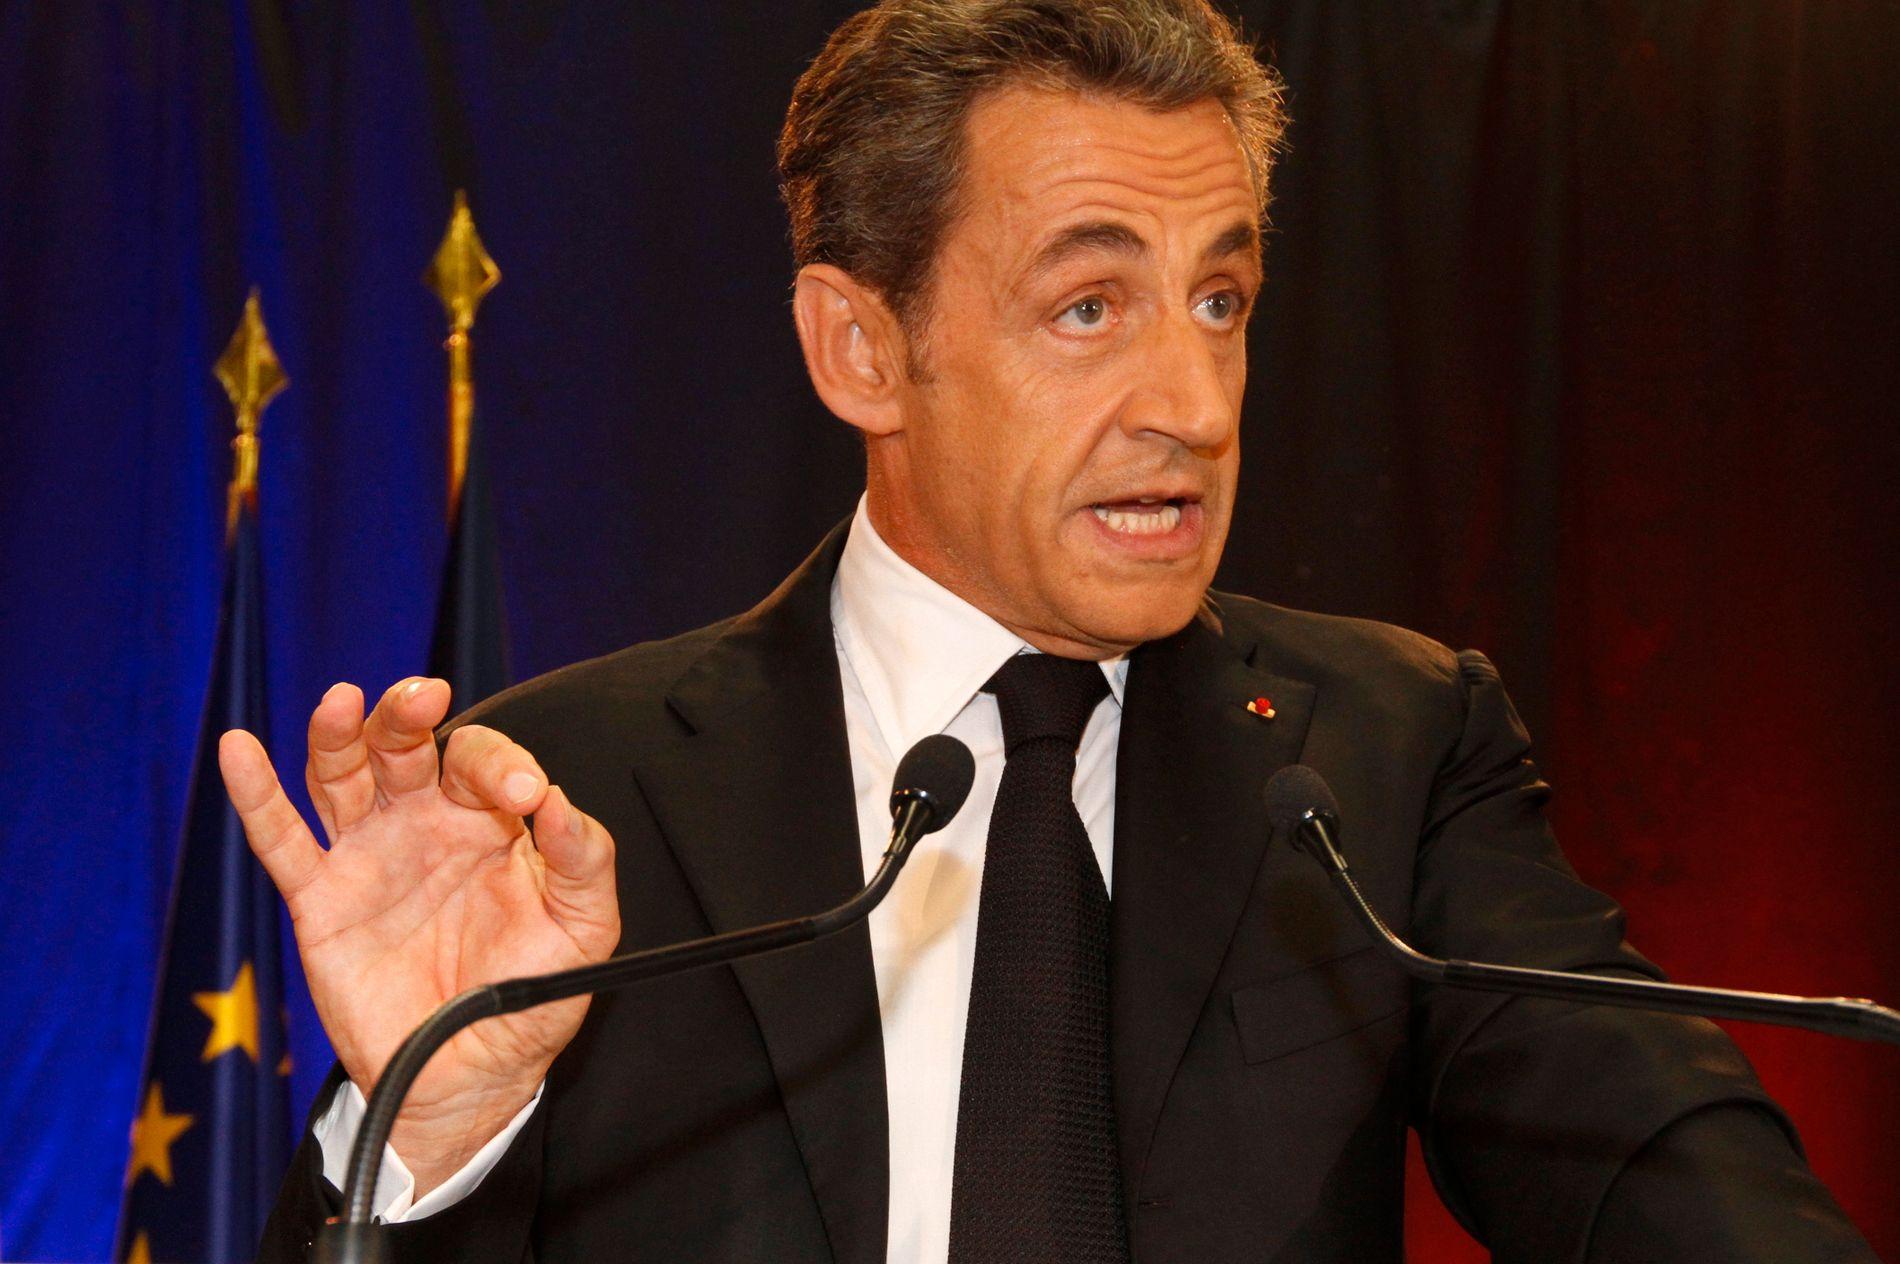 VARETEKTSFENGSLET: Frankrikes tidligere president  Nicolas Sarkozy. Her under et intervju i 2014.